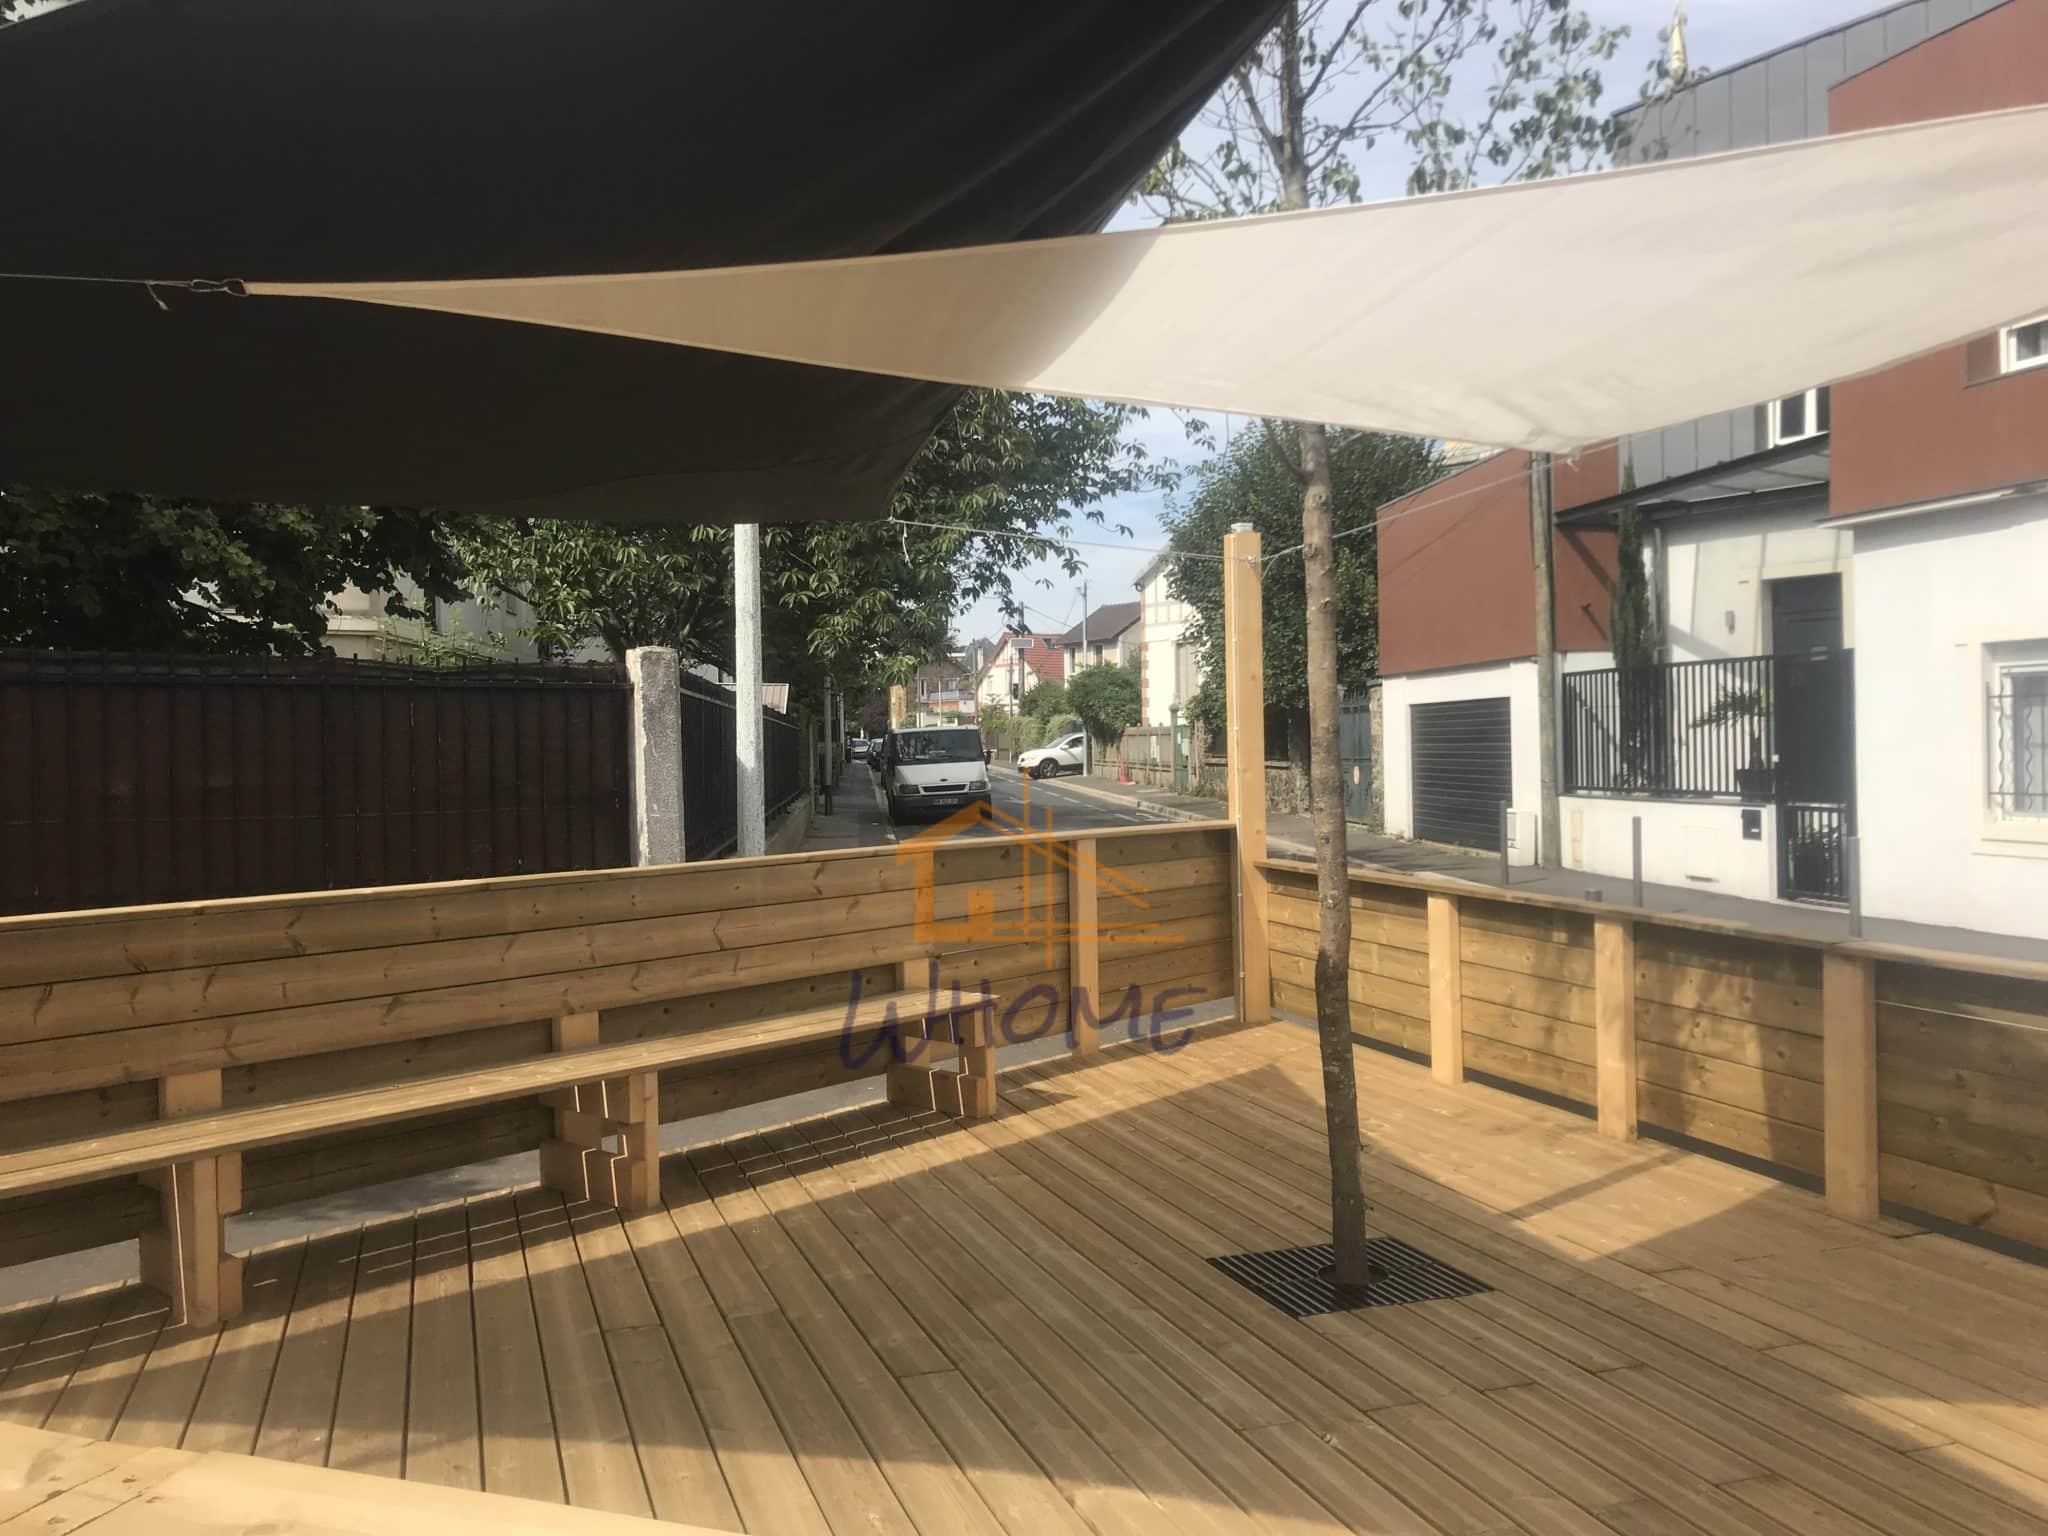 whome-terrasse-bois-restaurant-voile-banc-yvelines